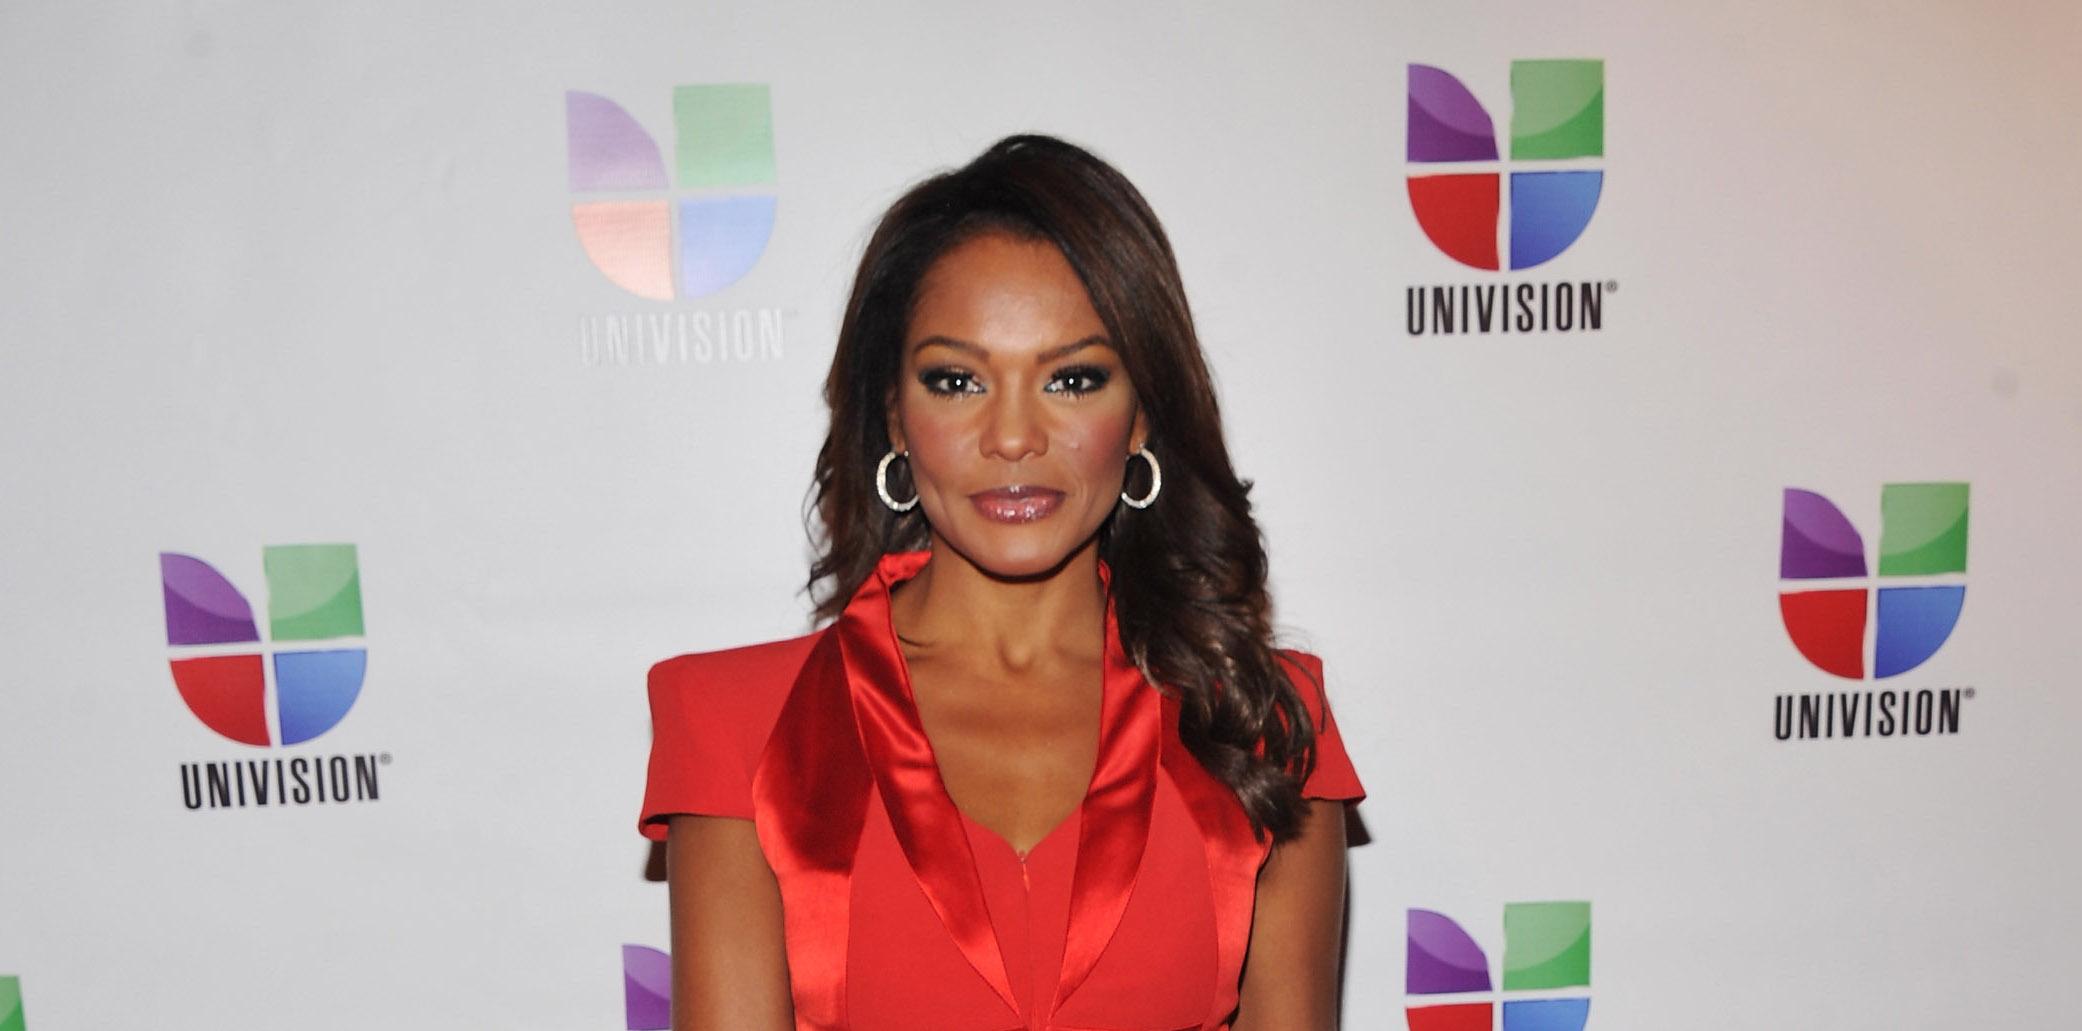 Ilia Calderón Will Make History as Univision's First Afro-Latina Evening News Anchor